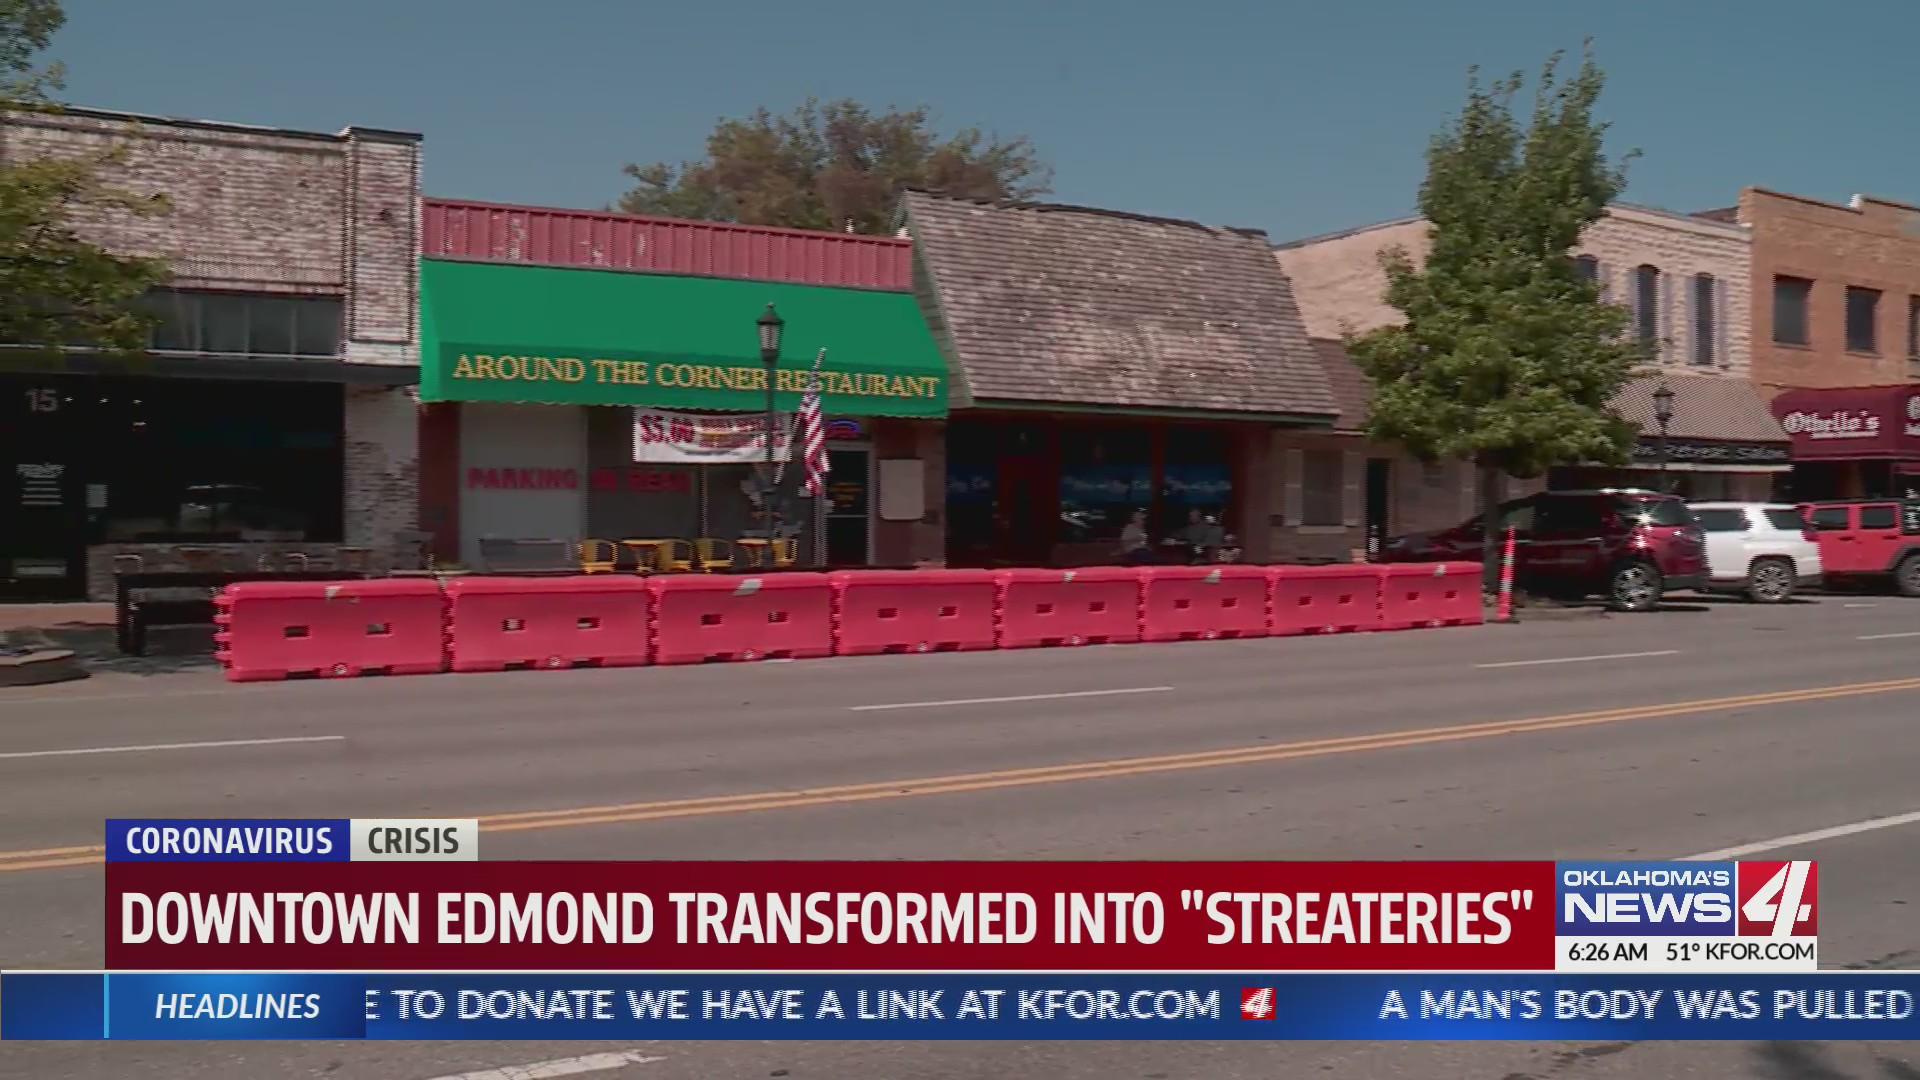 Edmond parking blocked off for outdoor dining